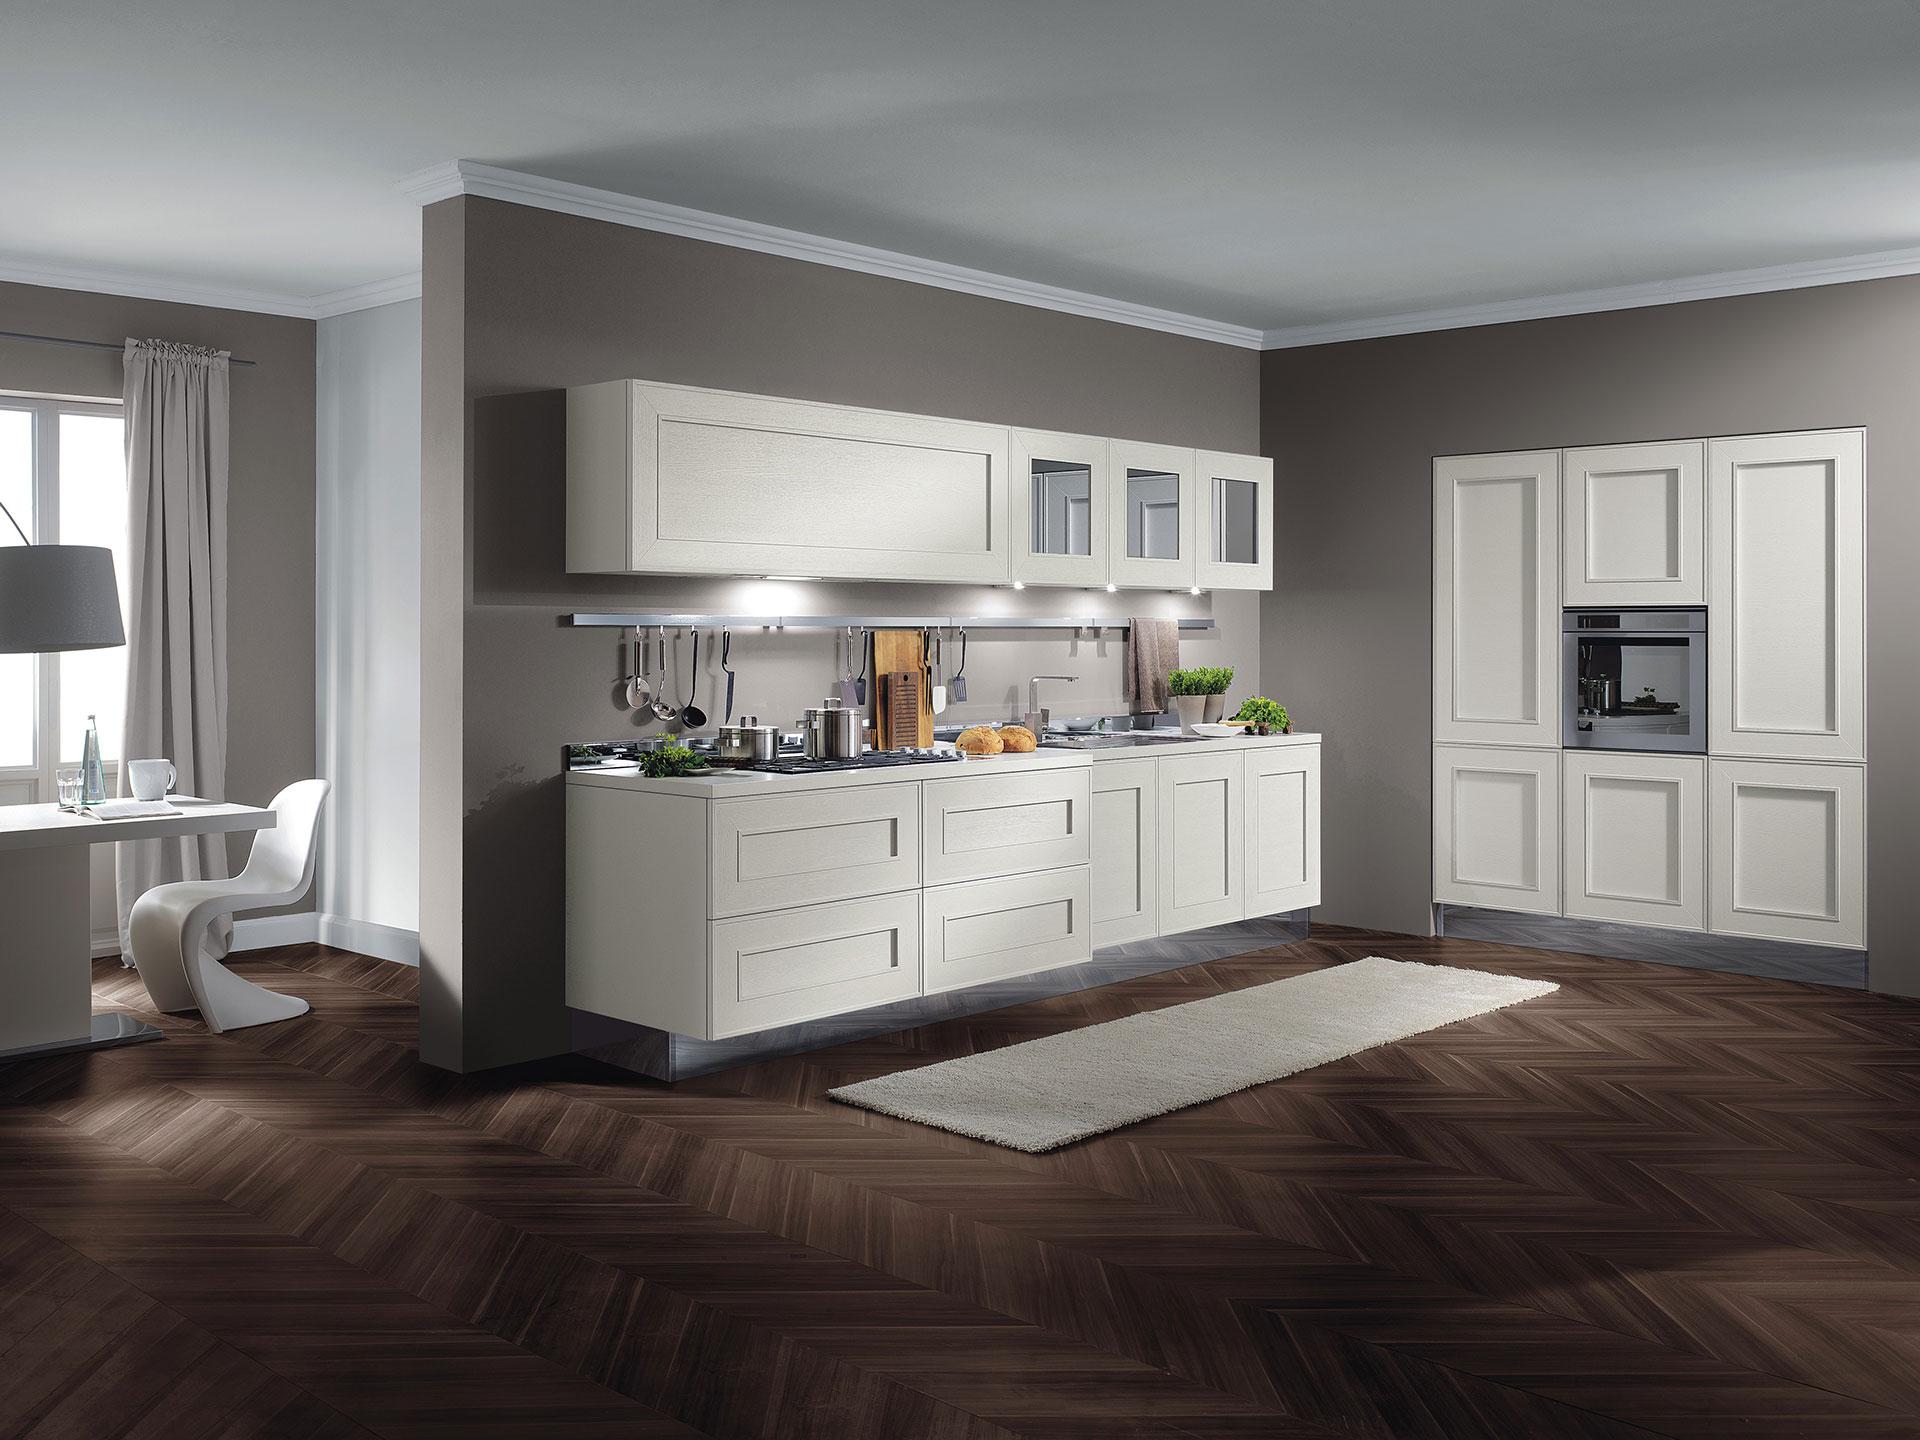 Melograno - arredamento cucina moderna - Mussi arredamento